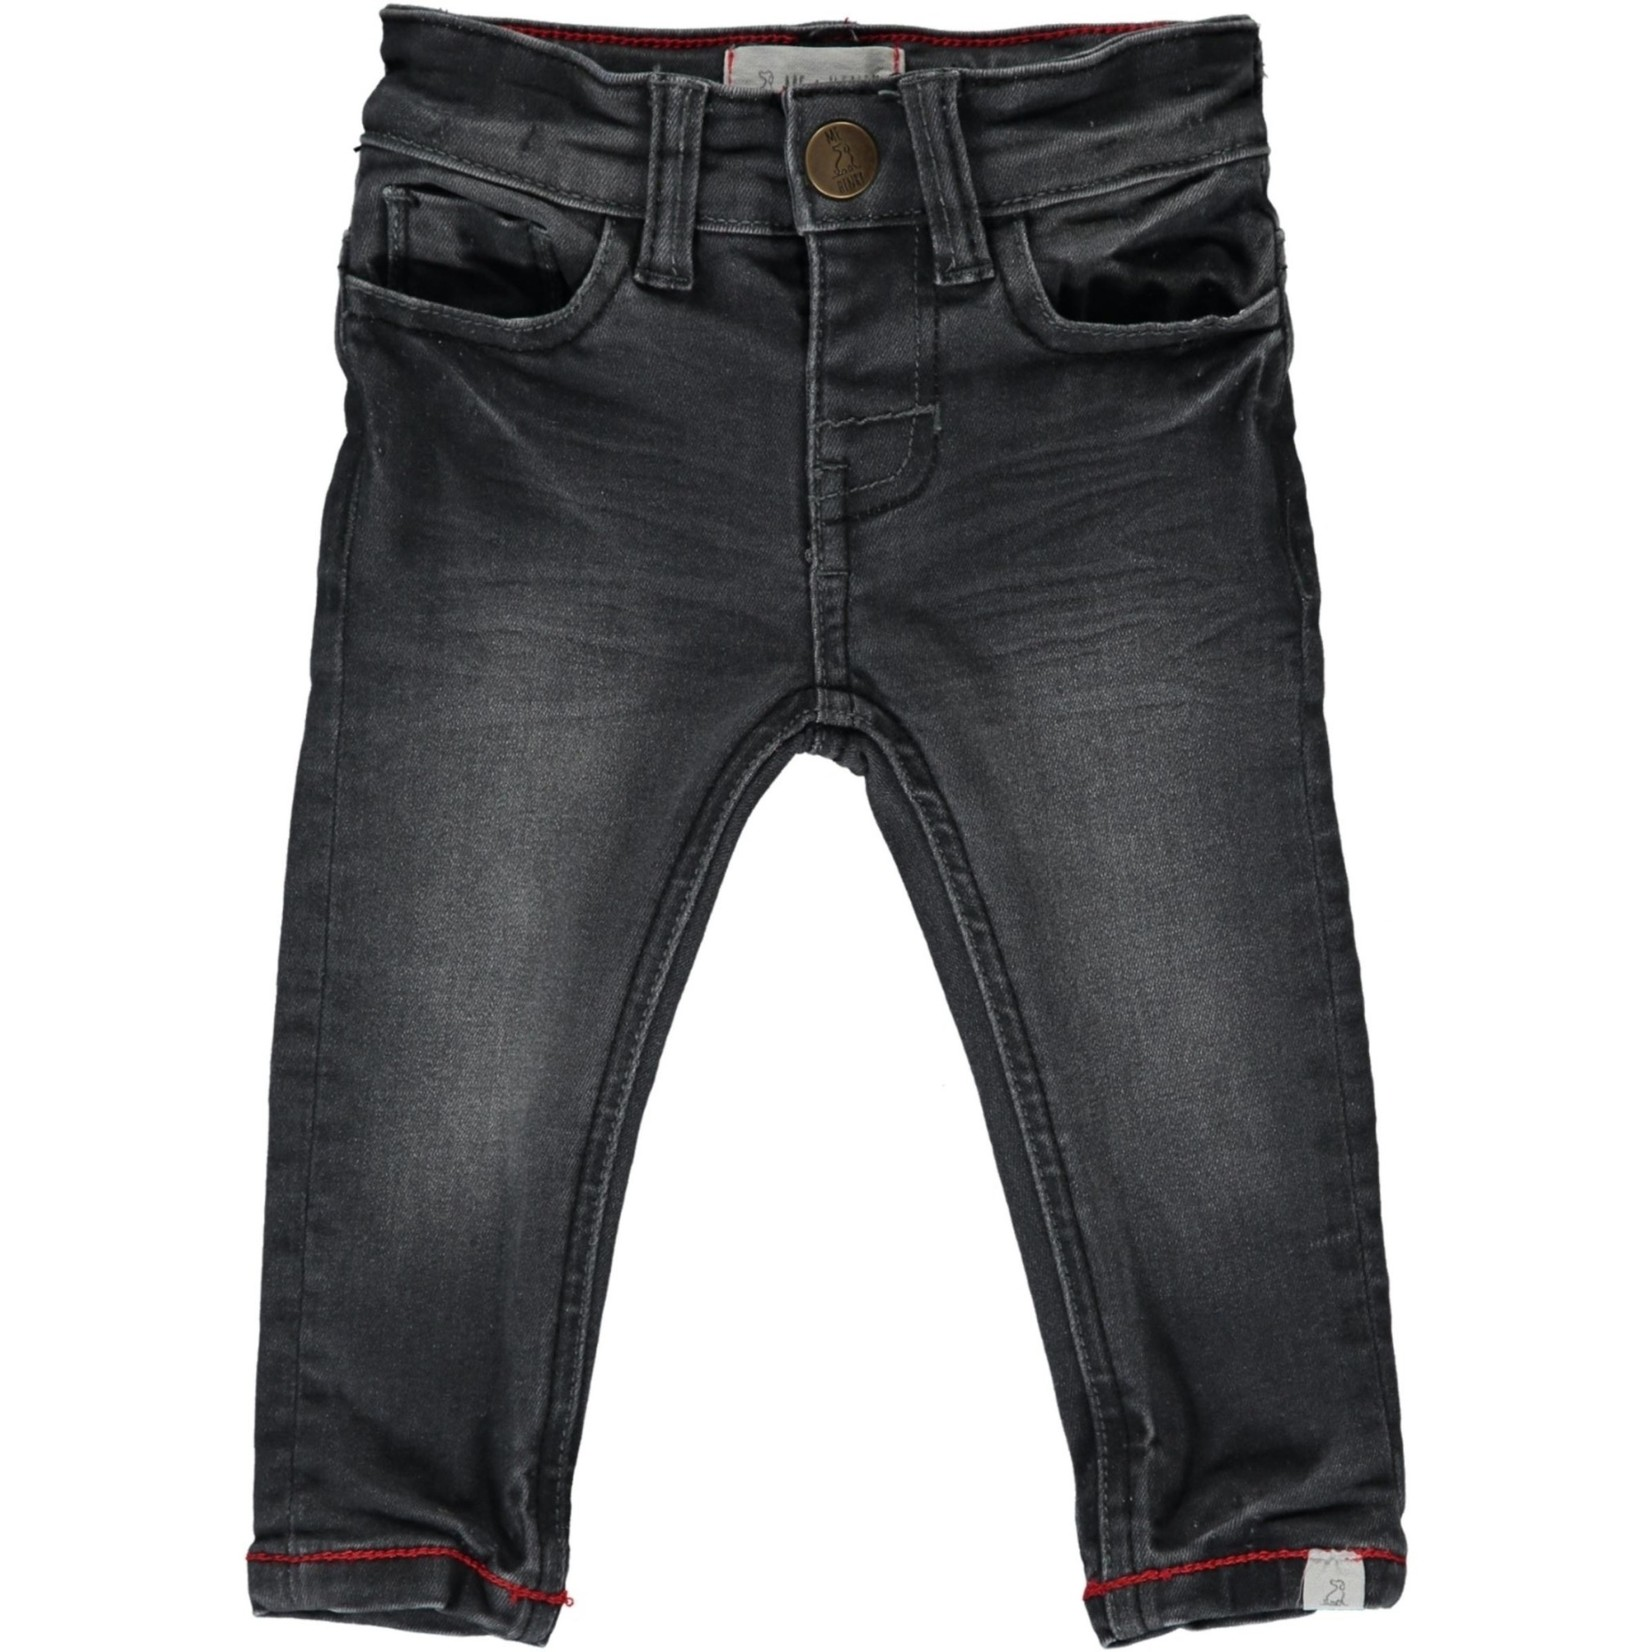 Me + Henry Charcoal Jeans Boy Slim Fit Denim Jeans